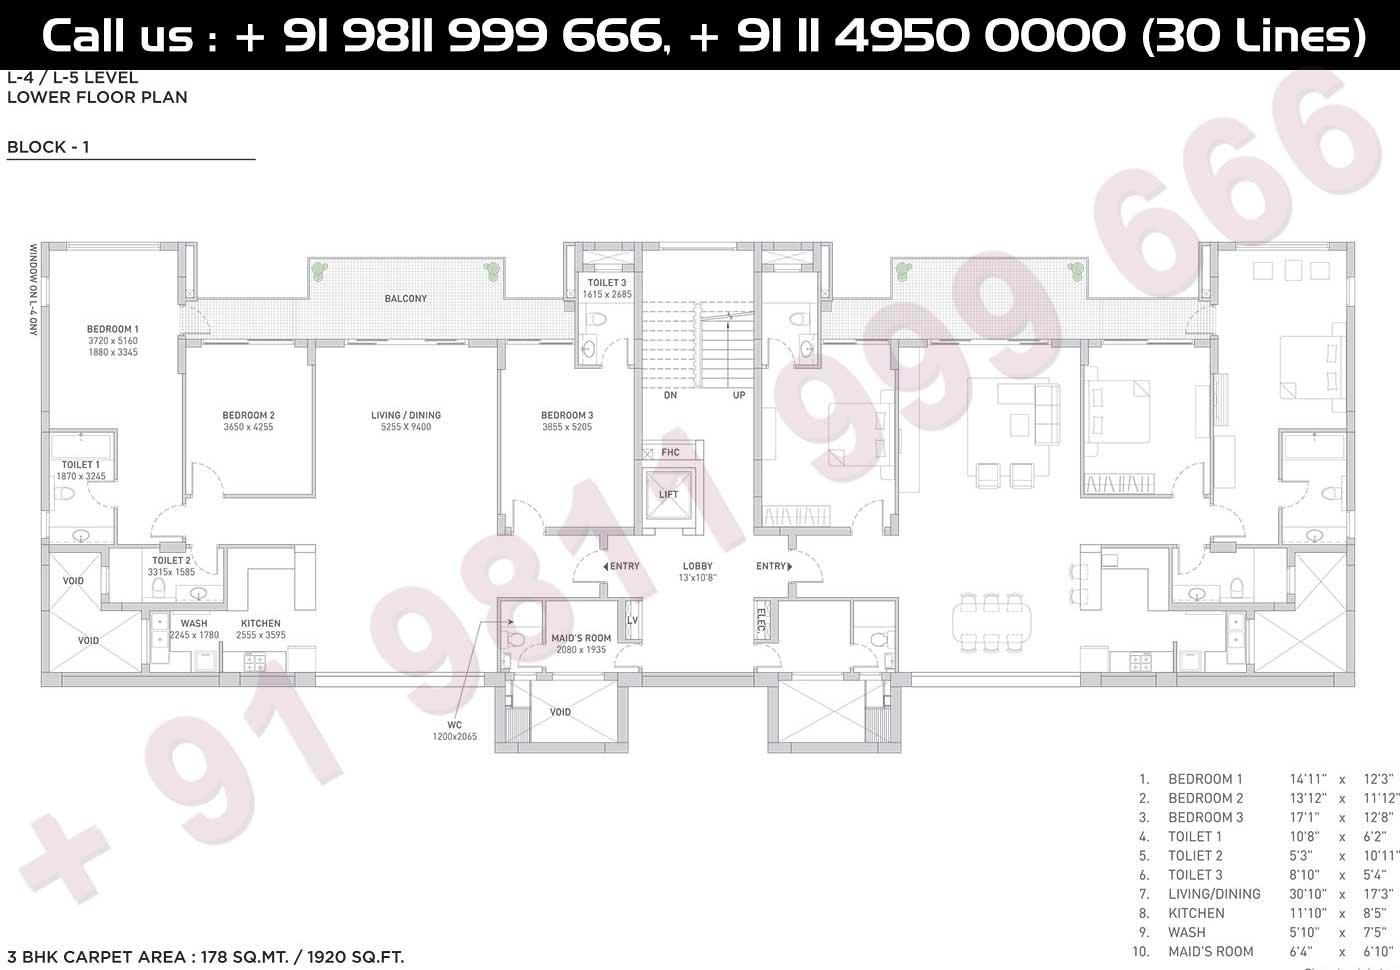 4 - 5 Level Lower Floor Plan, Block-1, Carpet Area, 178 Sqmt: 1920 Sq. Ft